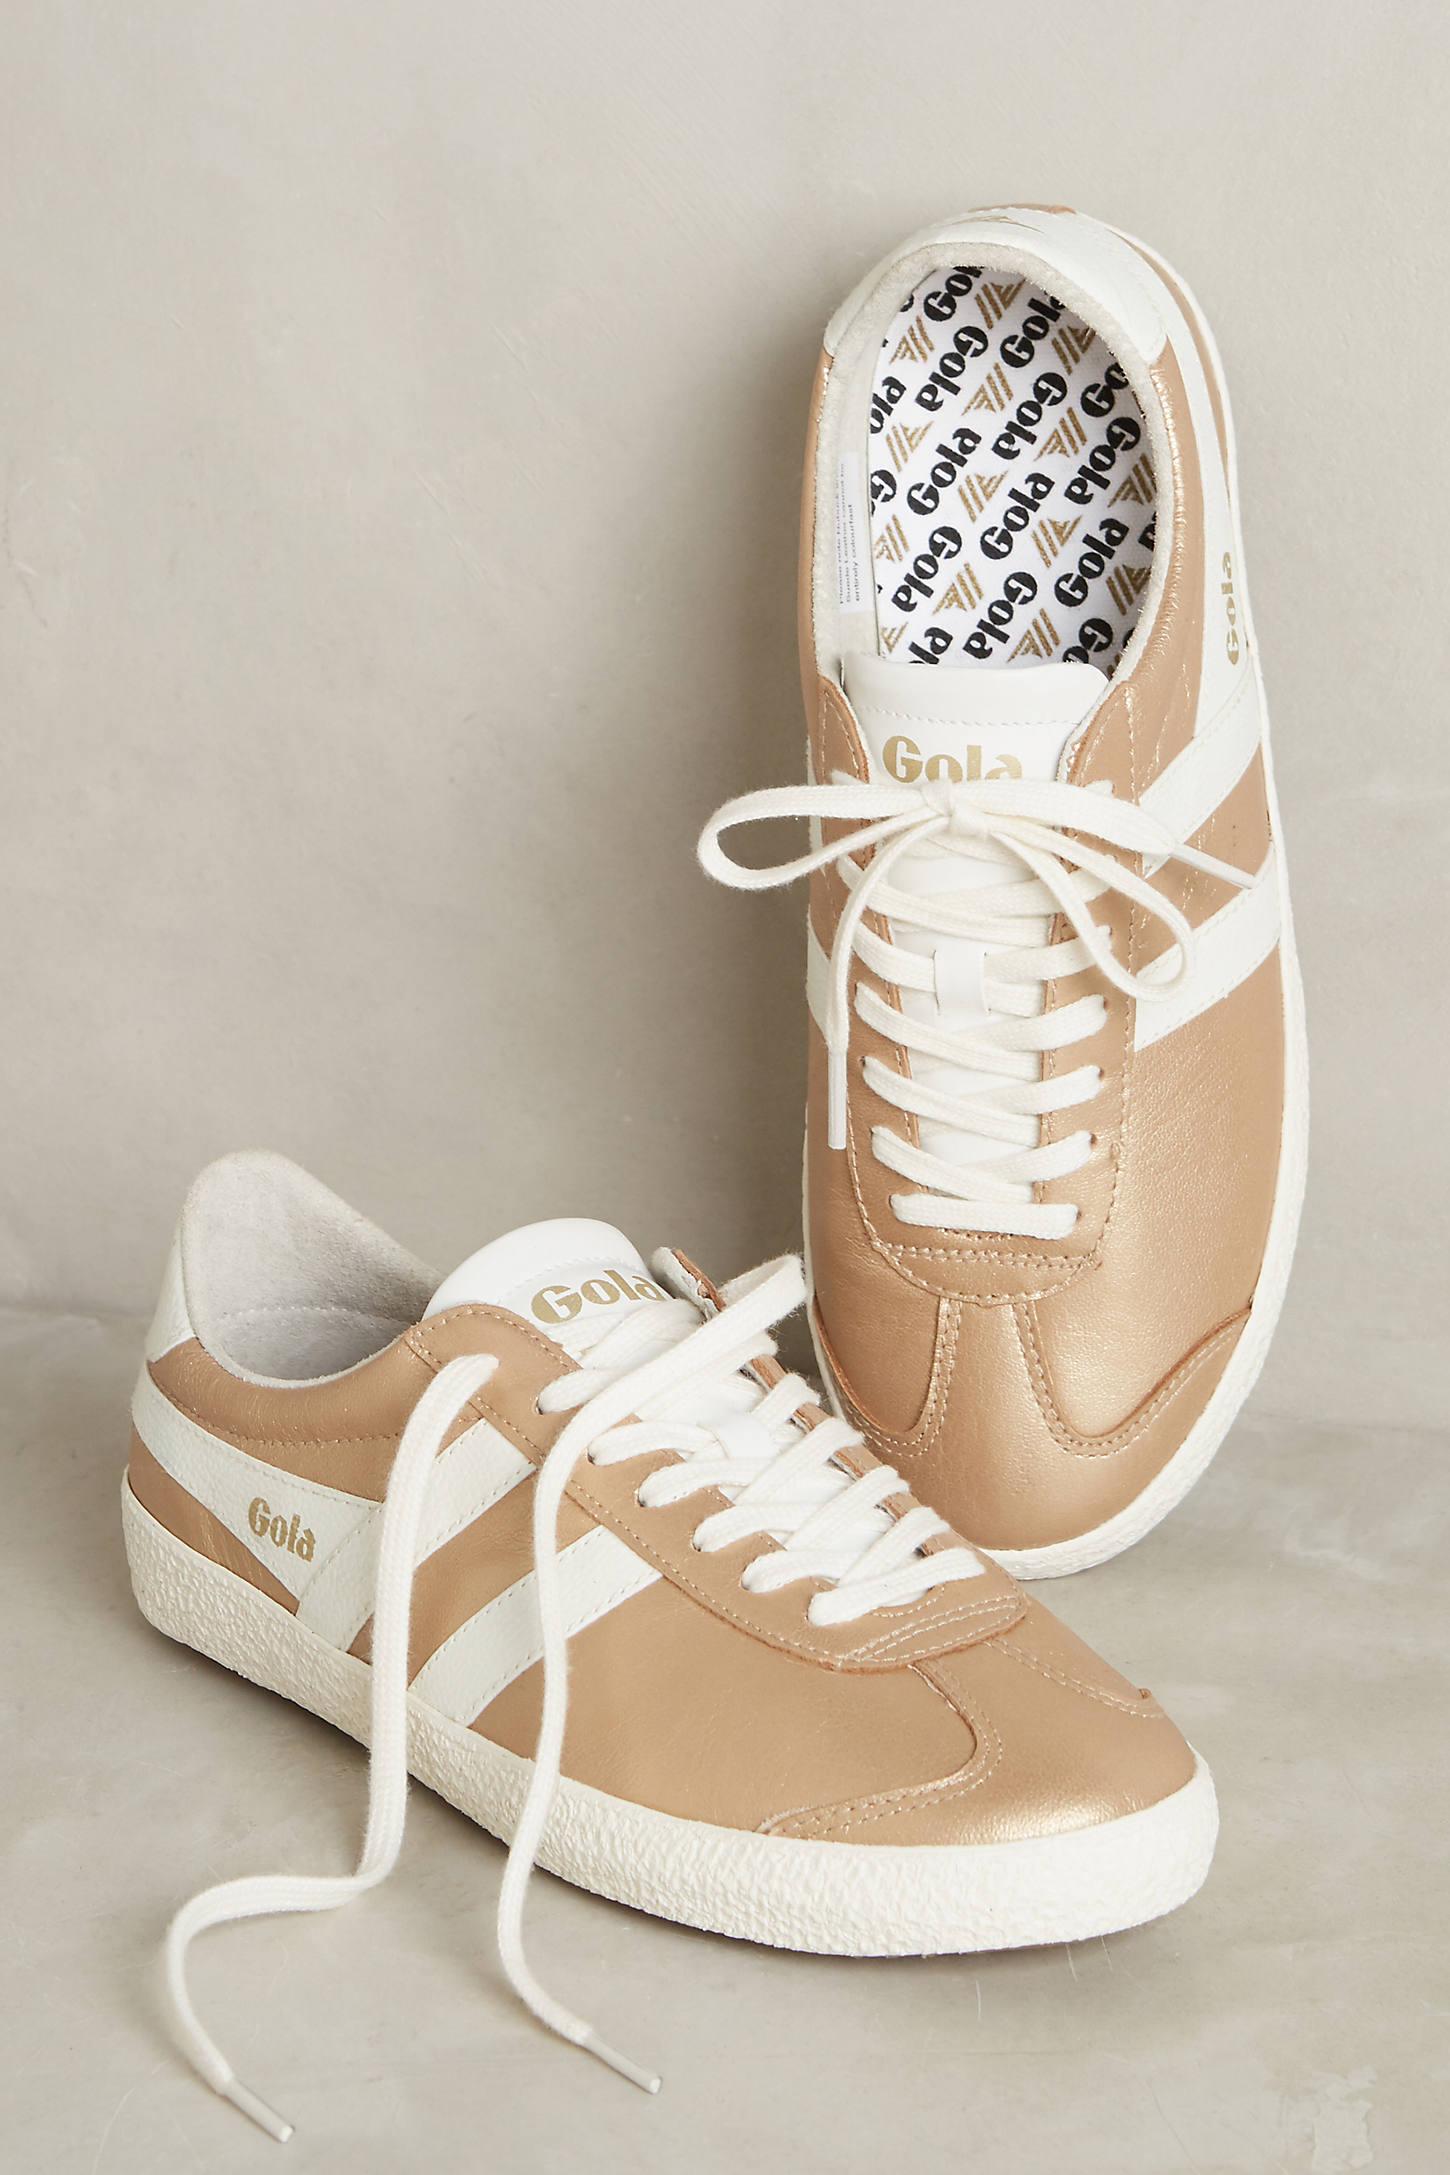 Gola Specialist Metallic Sneakers